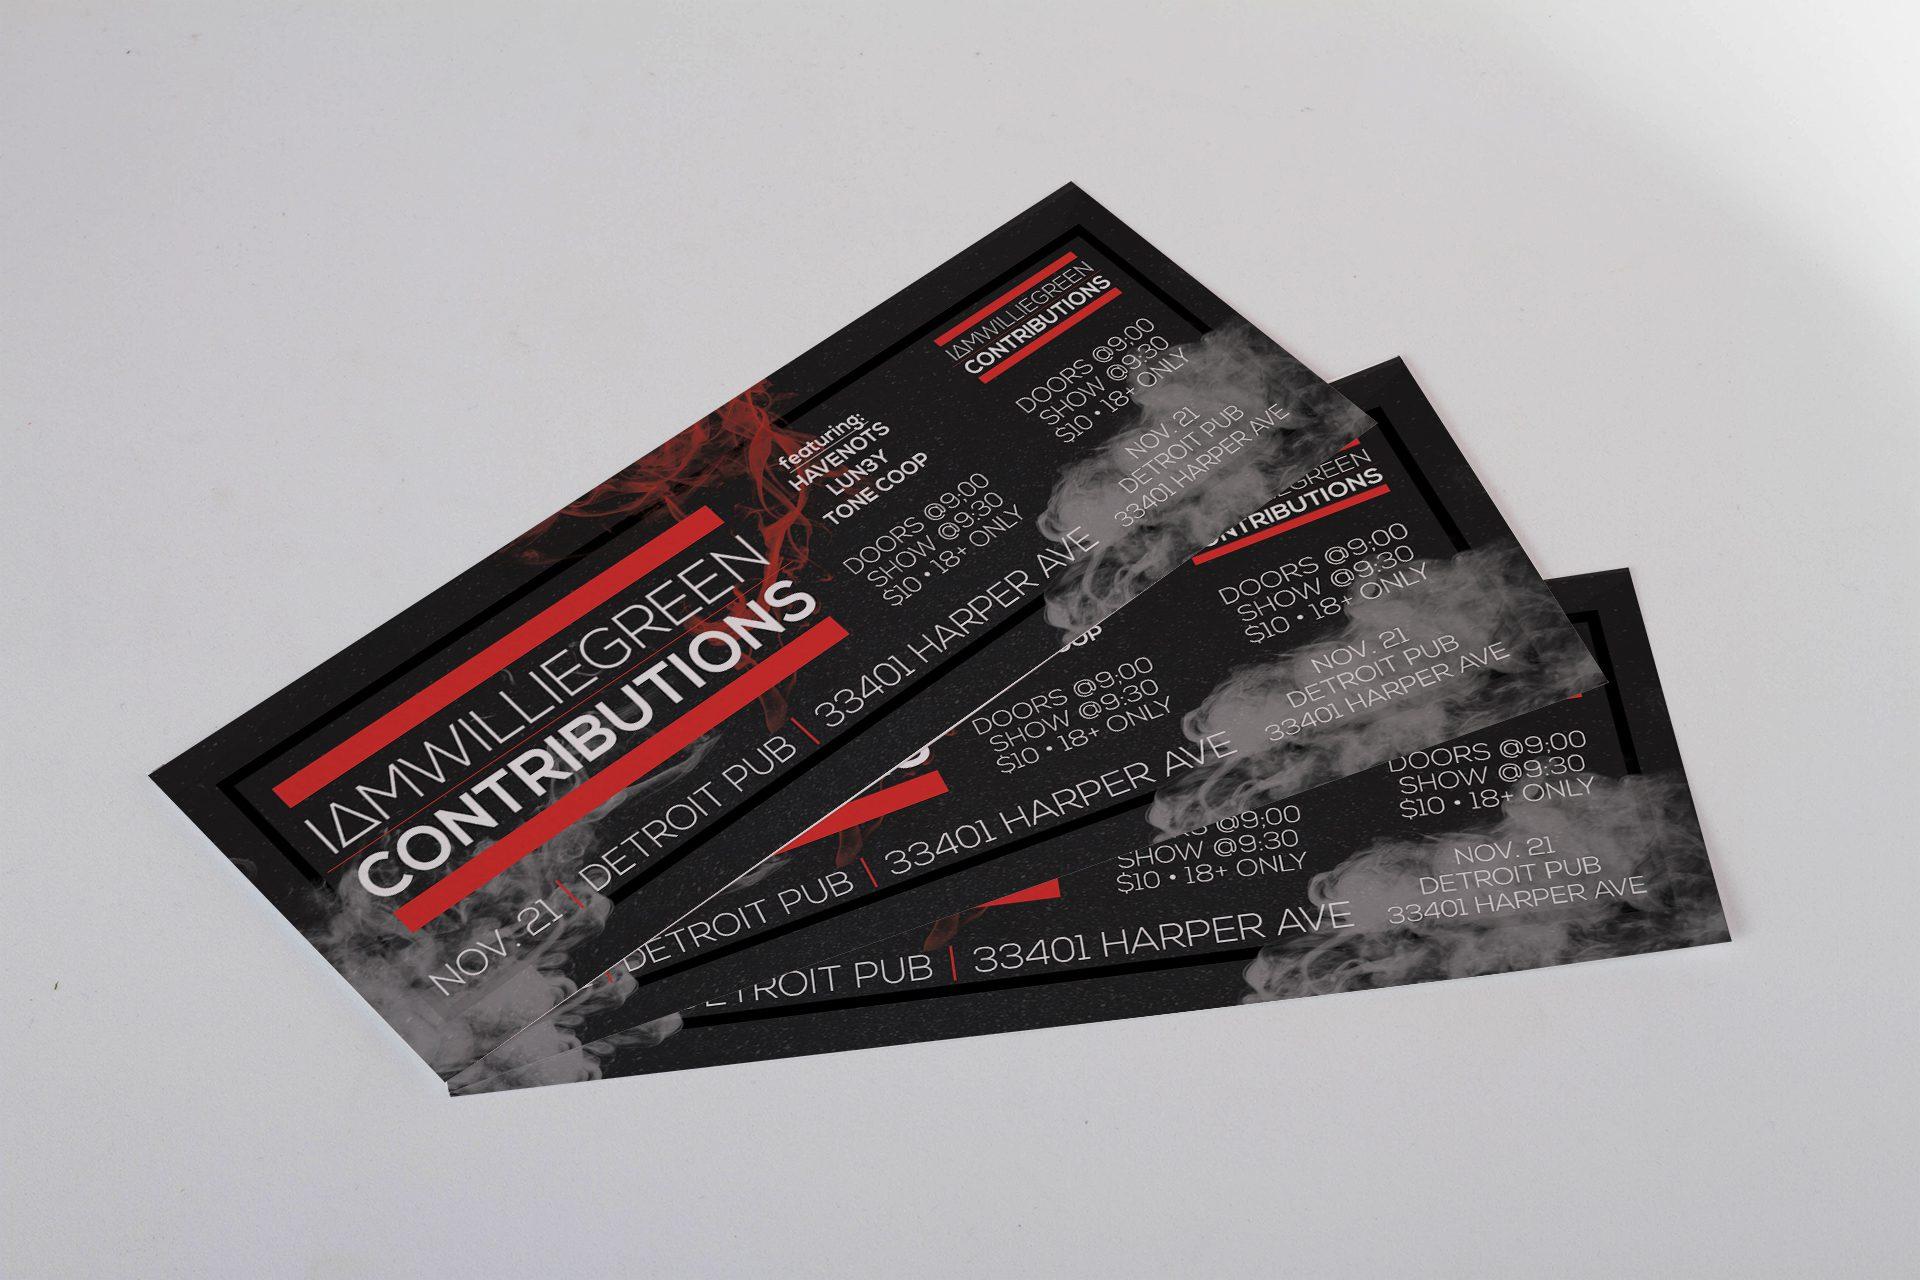 Detroit Pub - Event Tickets with Stub Mockup 02